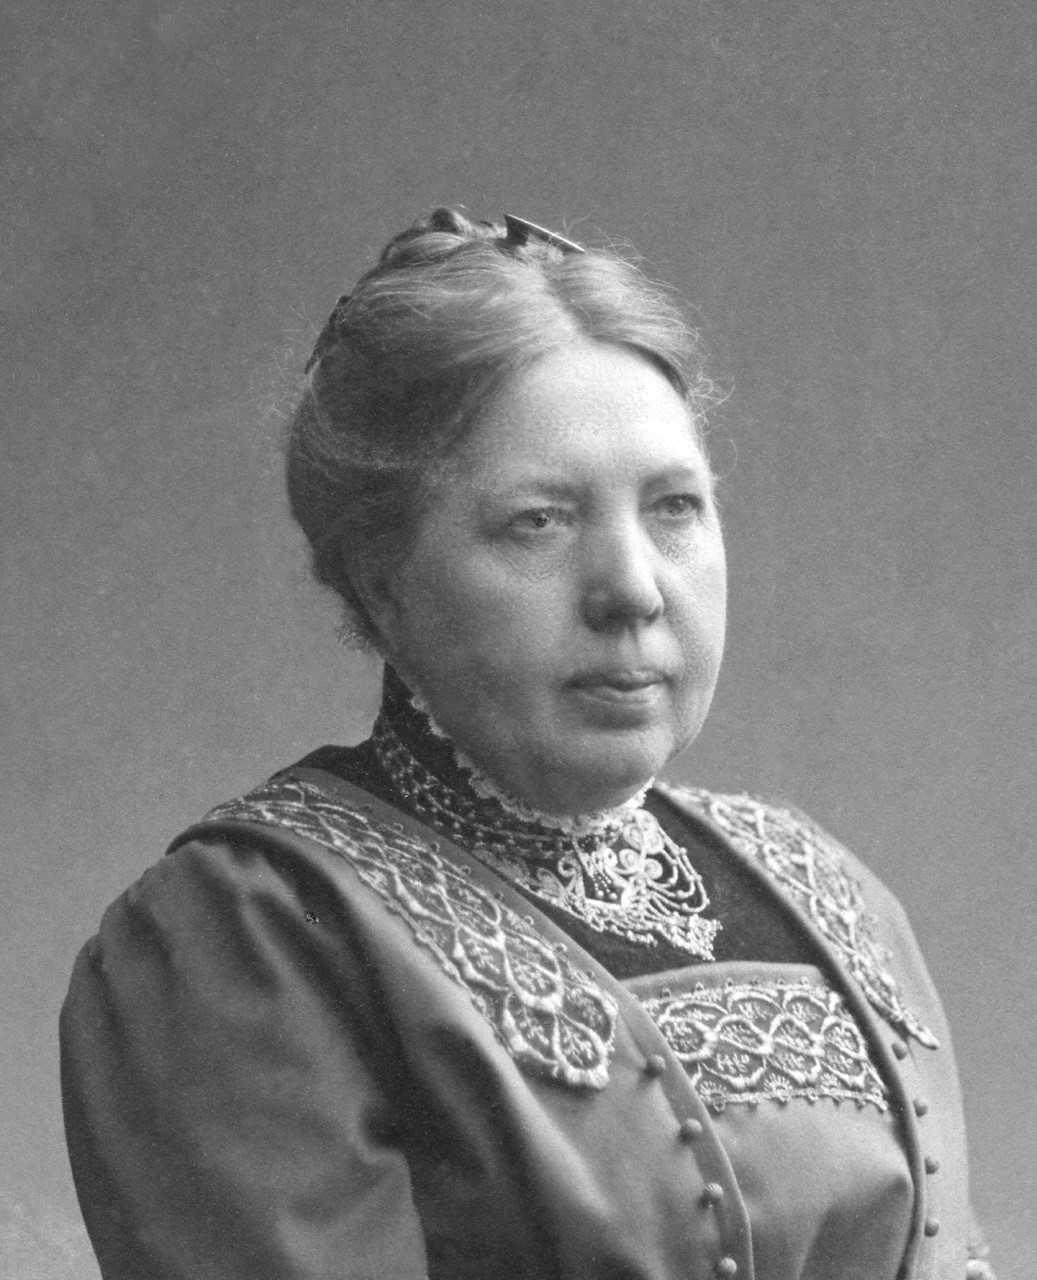 Ida Telland. Photographer and year unknown (Lindesbergs kulturhistoriska arkiv)